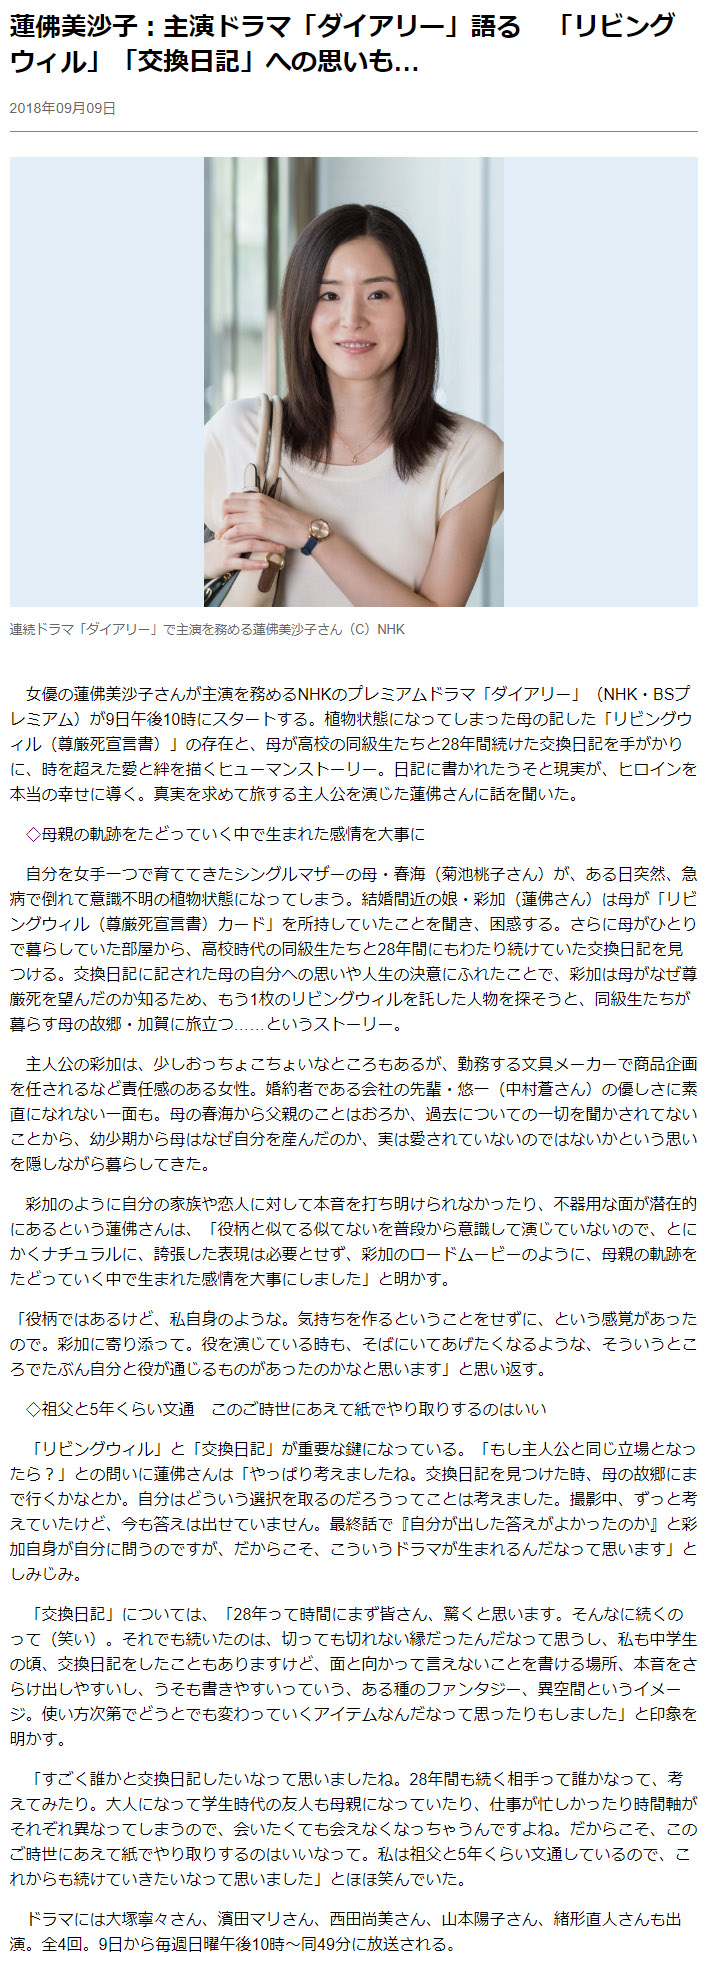 mantan-web2018_09_09-00.jpg